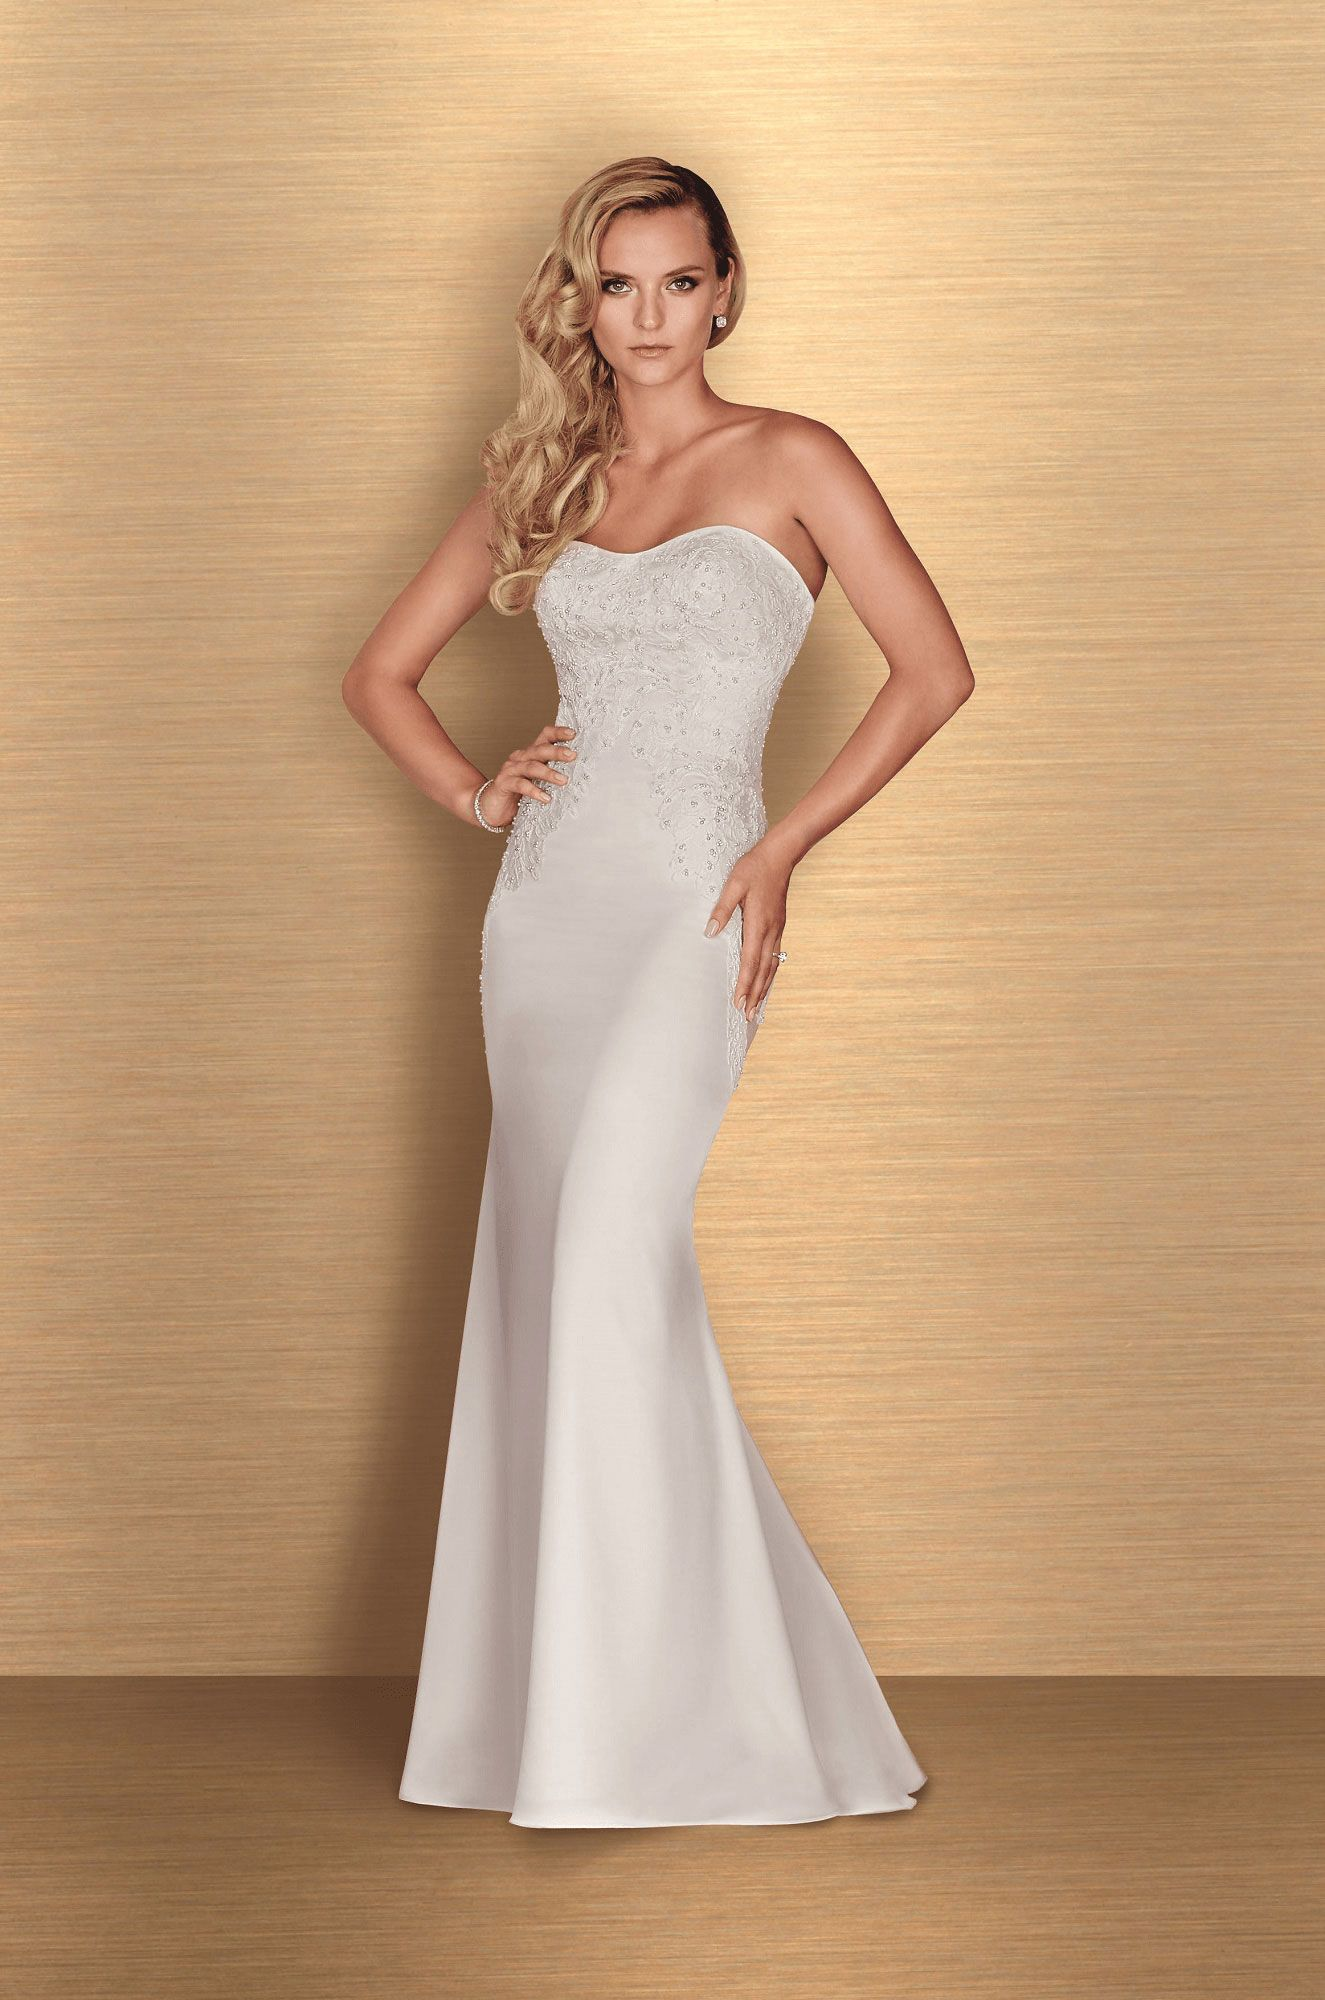 Satin beaded wedding dress style paloma blanca satin